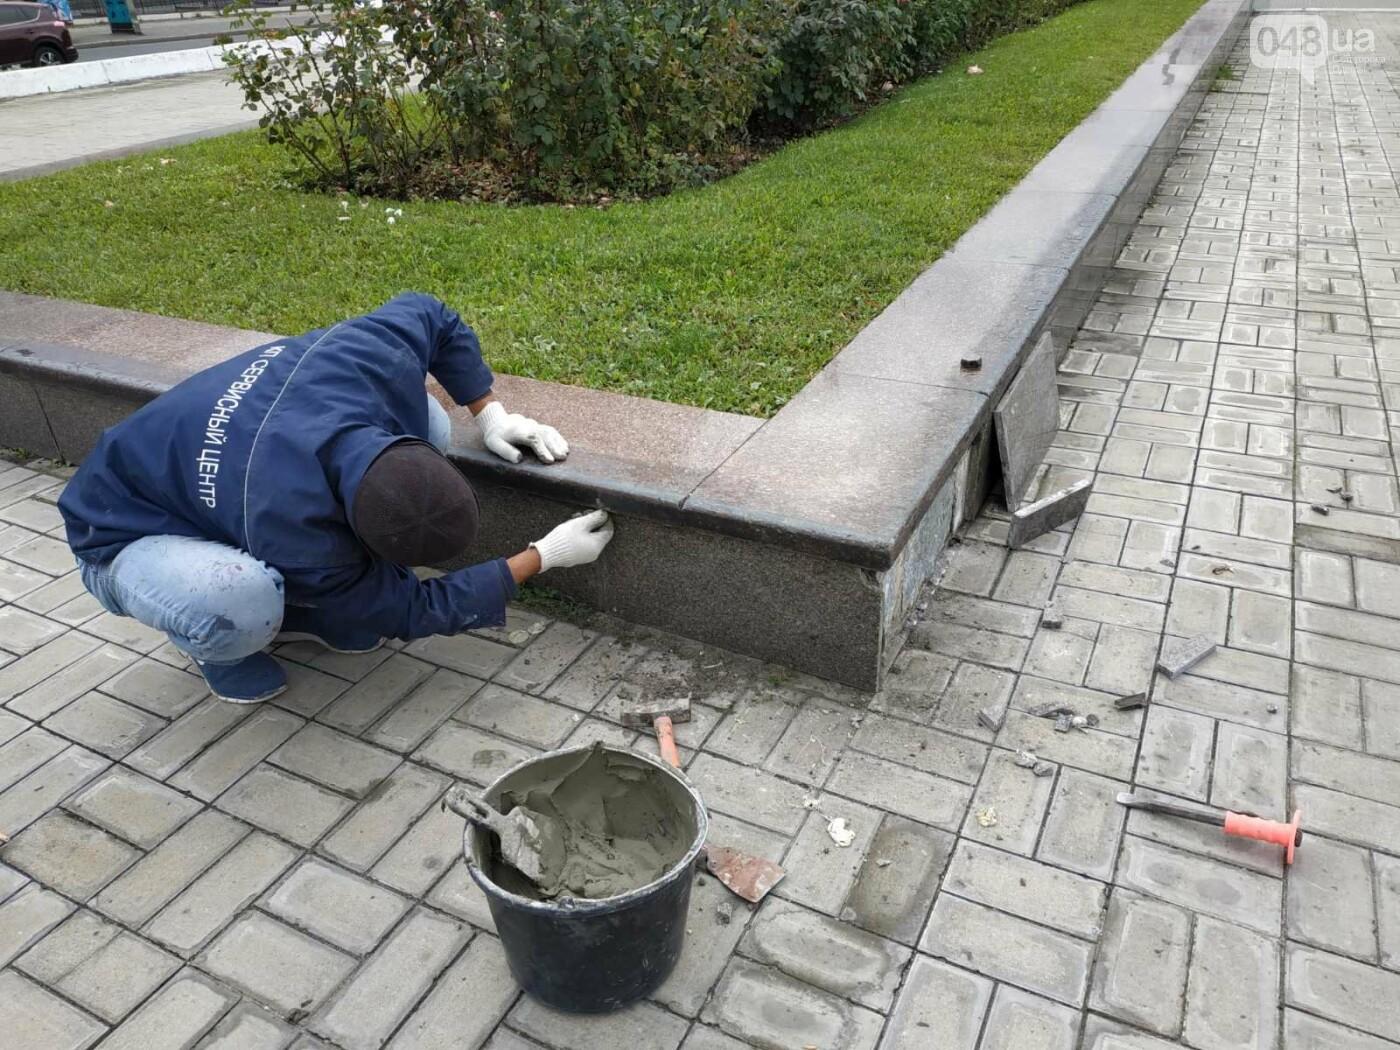 Вандалы разрисовали обелиск на площади 10 апреля в Одессе, - ФОТО2